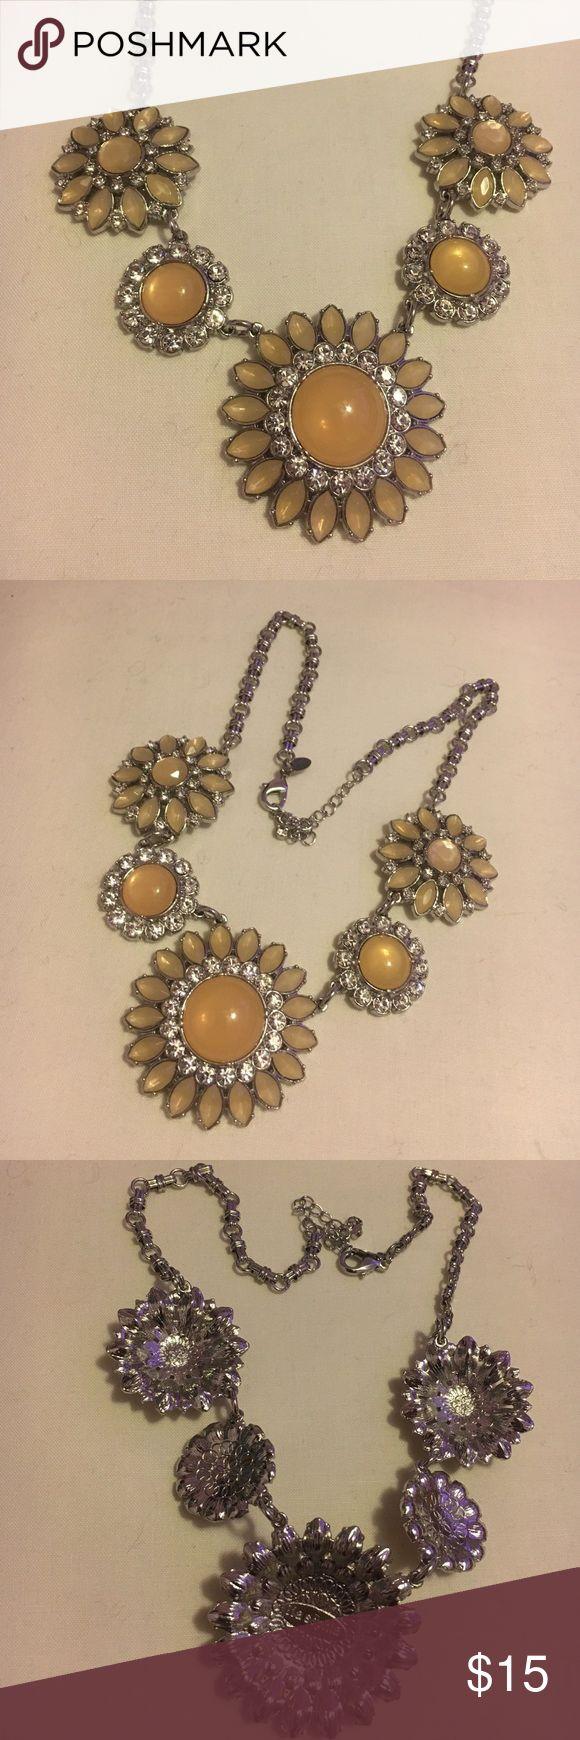 Lia Sophia necklace Beautiful lia Sophia yellow and off white colored necklace!CYBER MONDAY DEAL $10 Lia Sophia Jewelry Necklaces